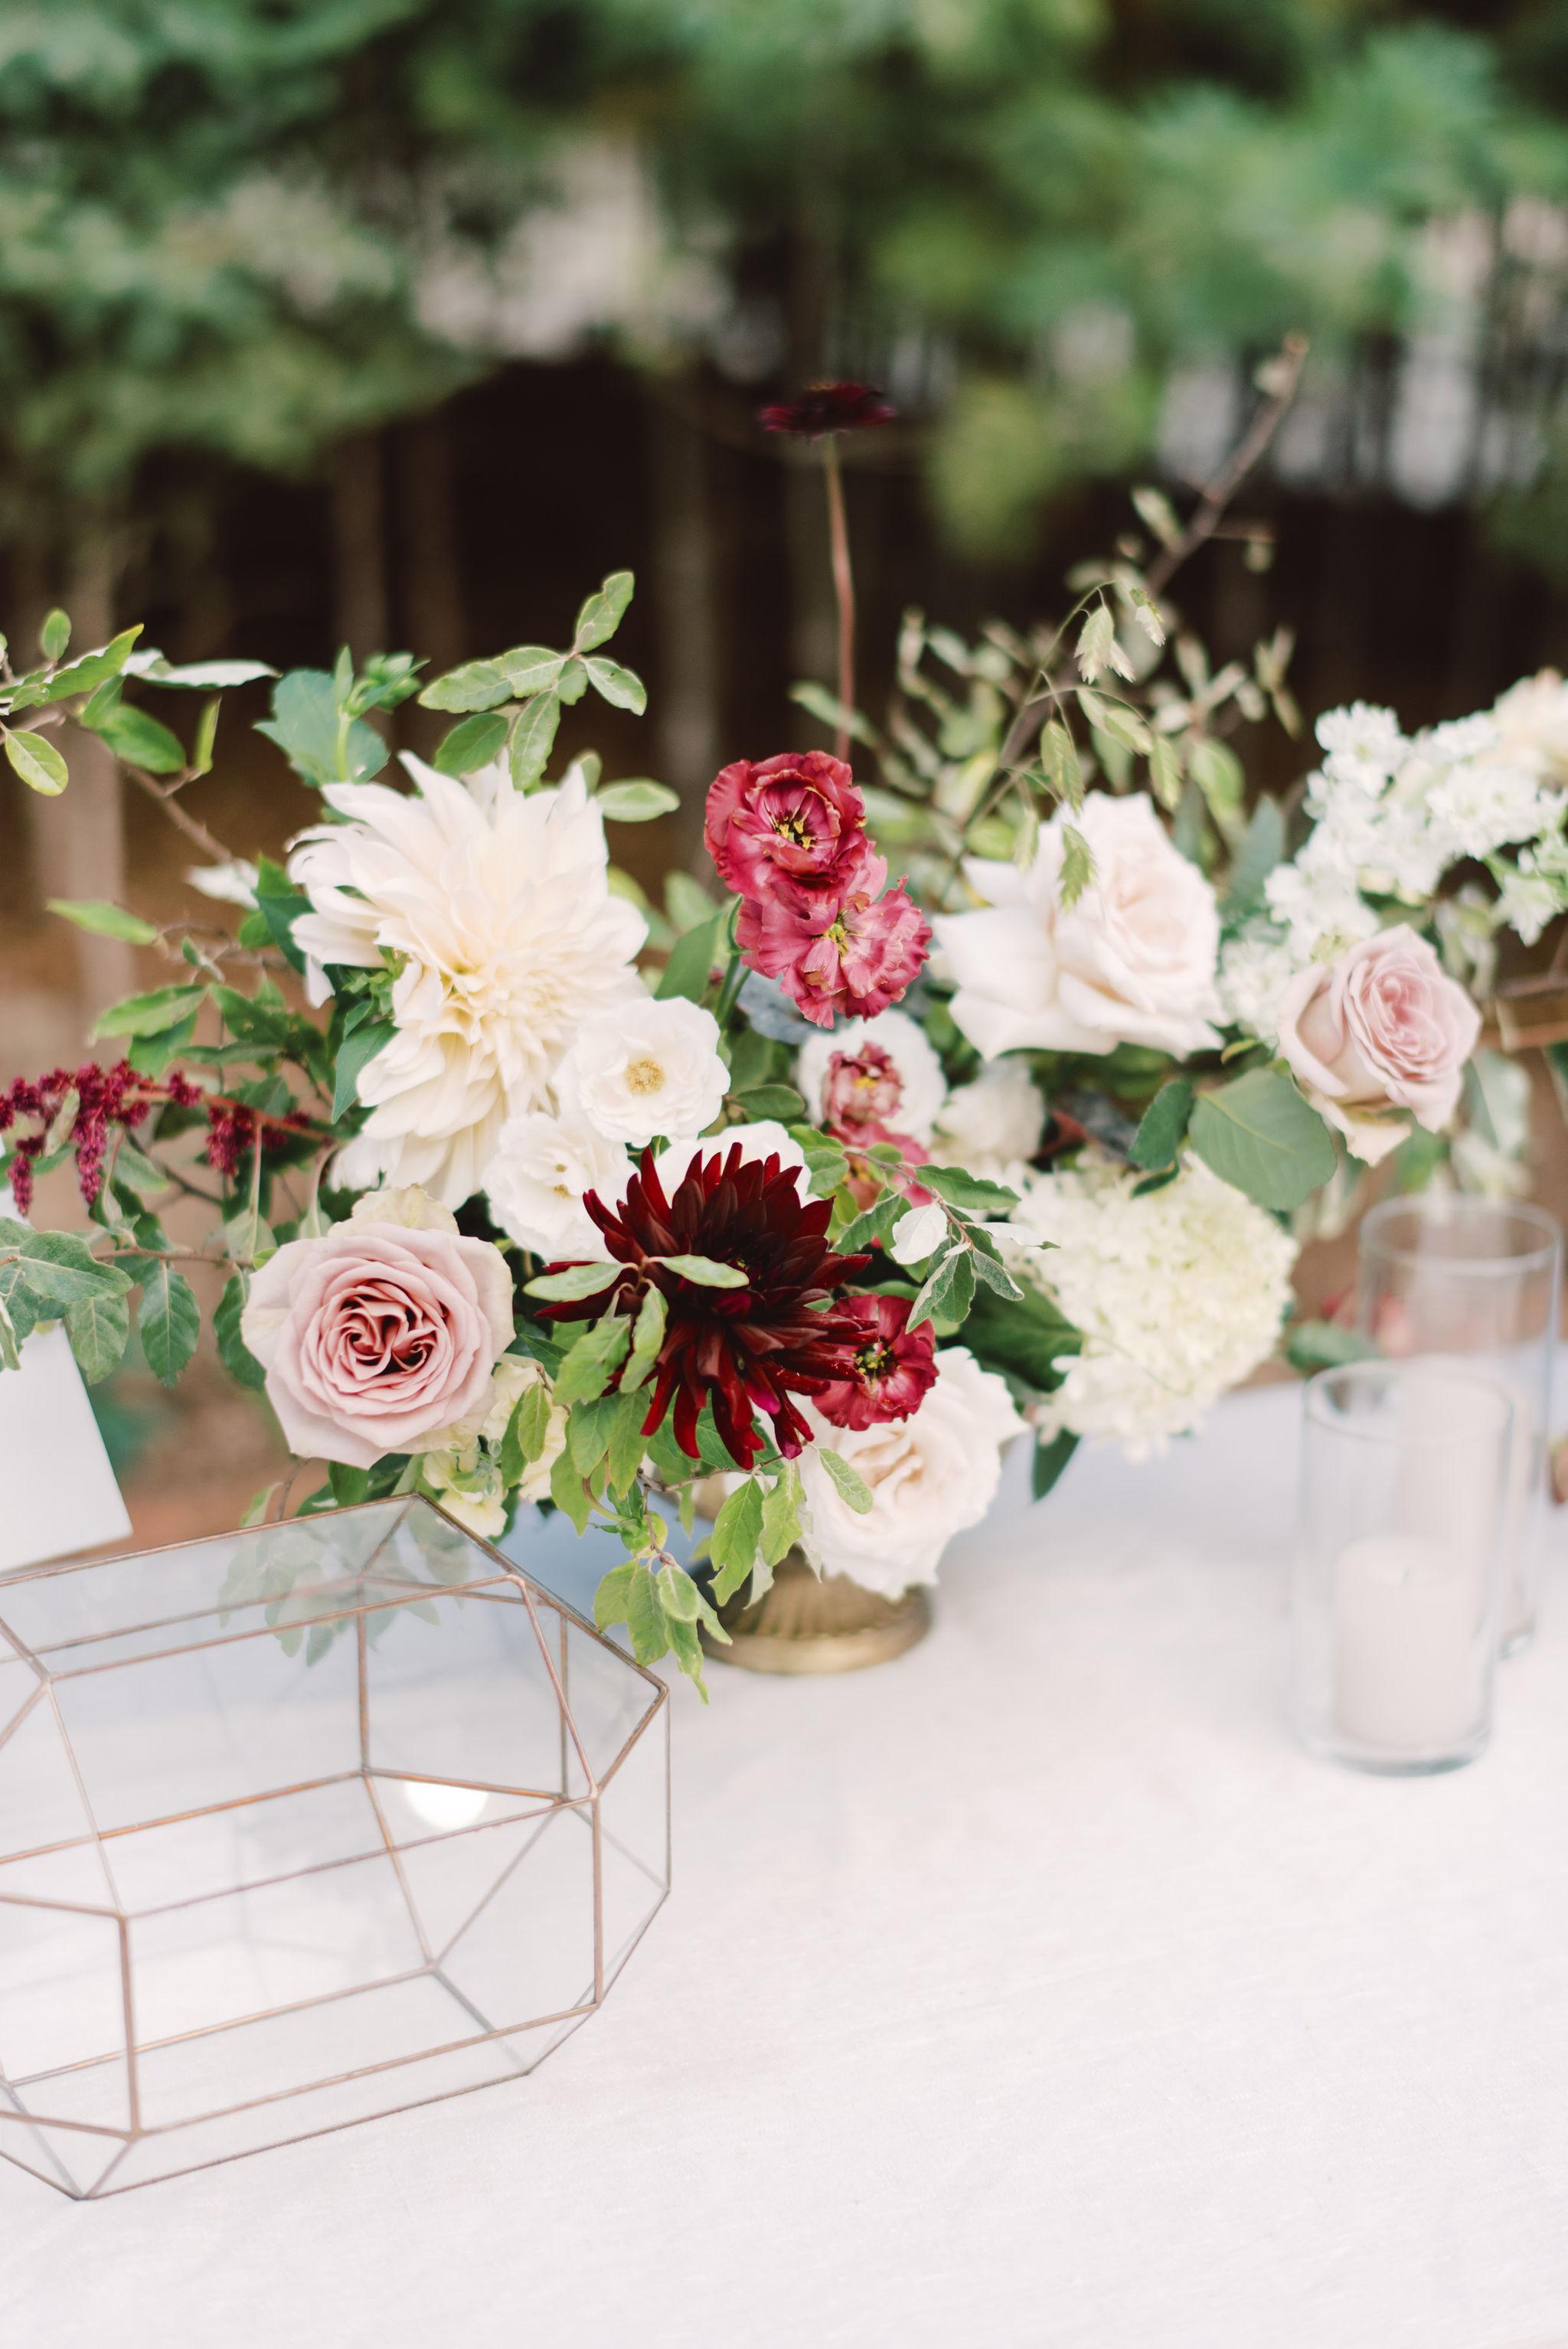 0943-artiese-evergreen-brickworks-wedding-ashleycraig-10233.jpg